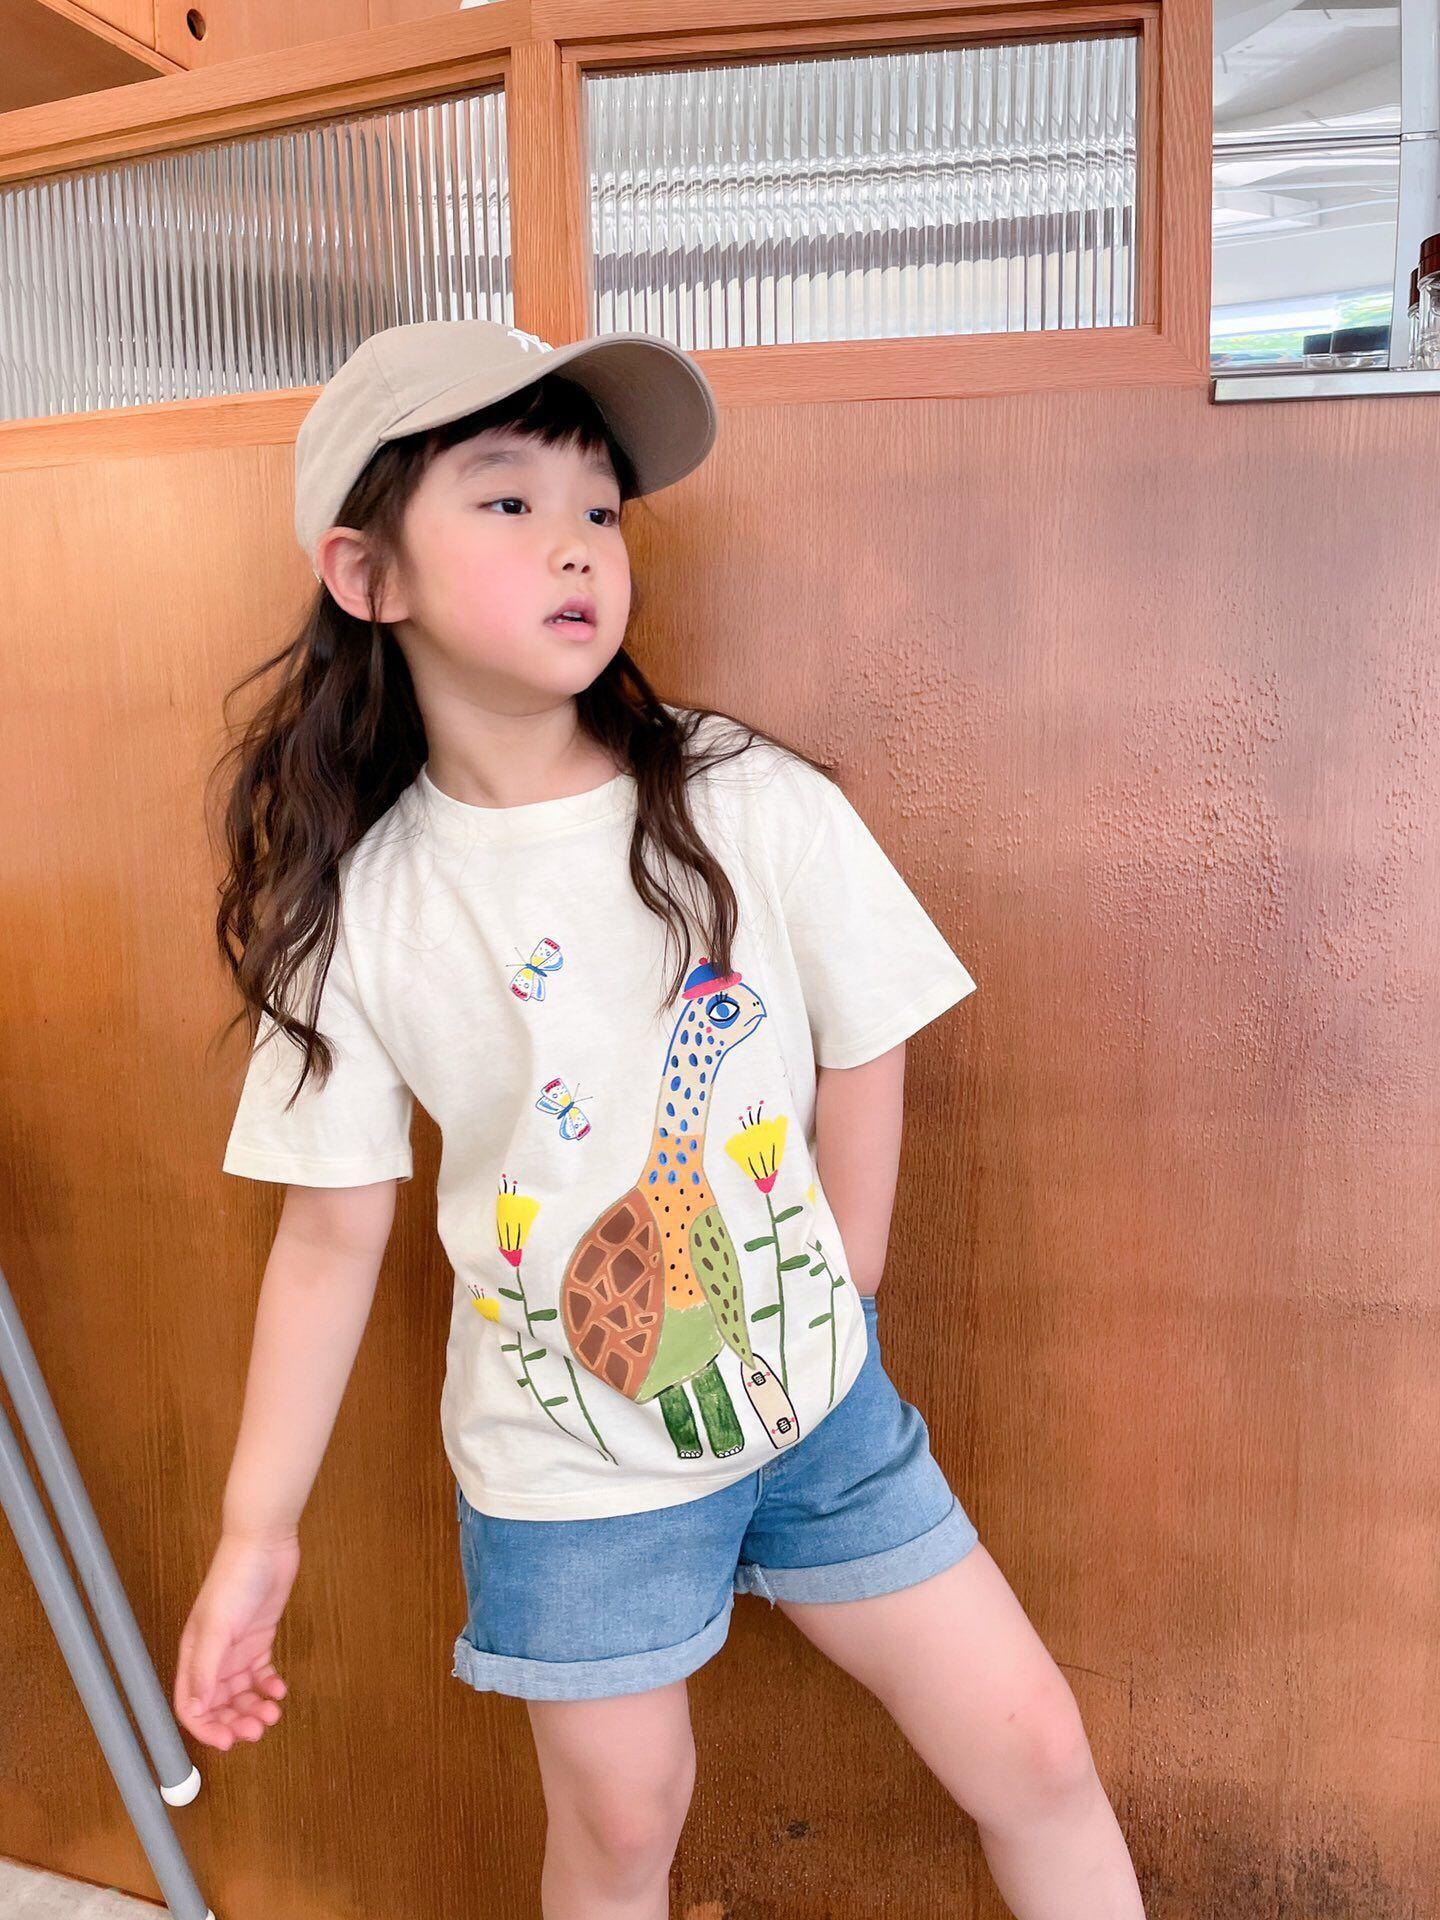 2021 free shipping Children's T-Shirt Children for Boys Girls Kids Kid's Shirts Child Baby Toddler Cotton Cartoon Tee Tops Clothing Sho